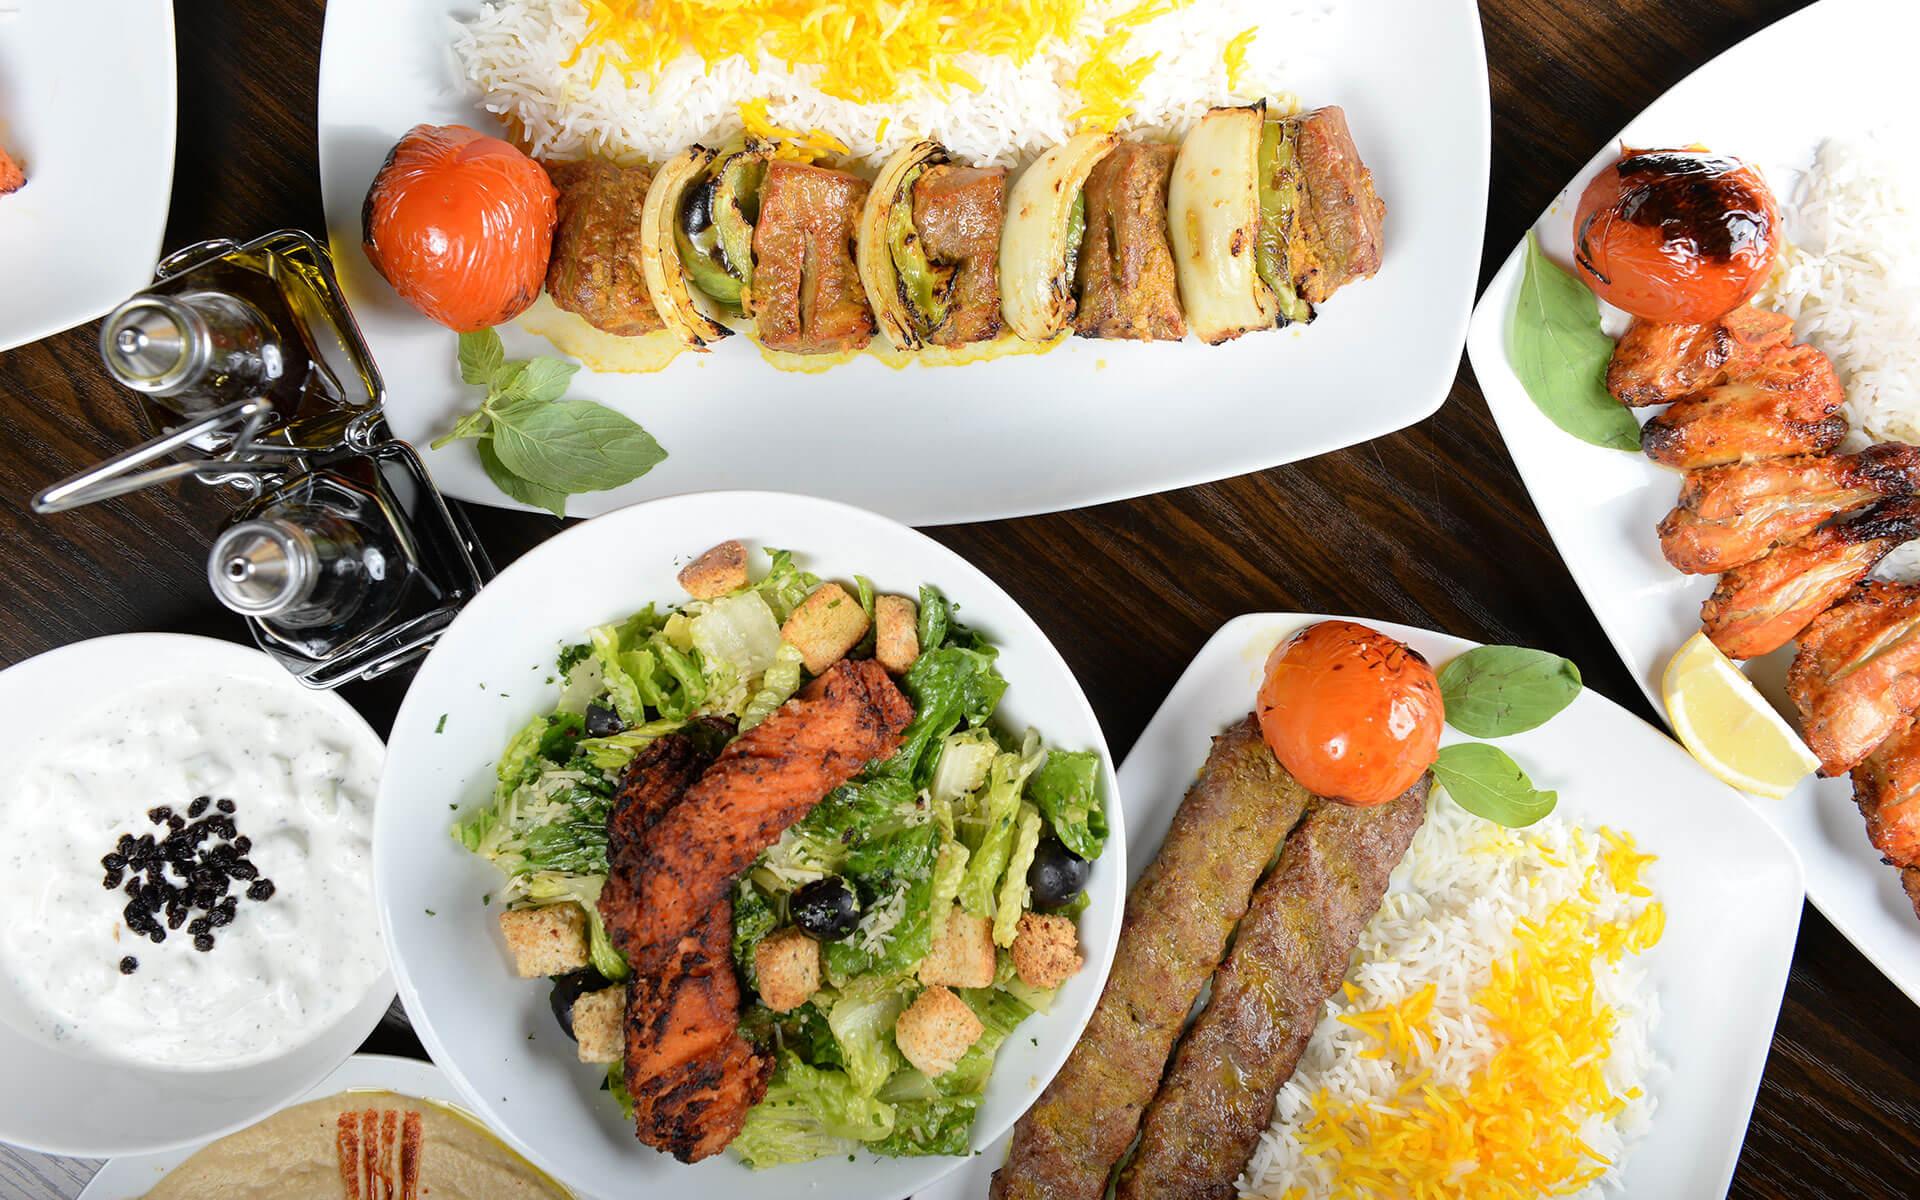 Slide: BMG Food 2